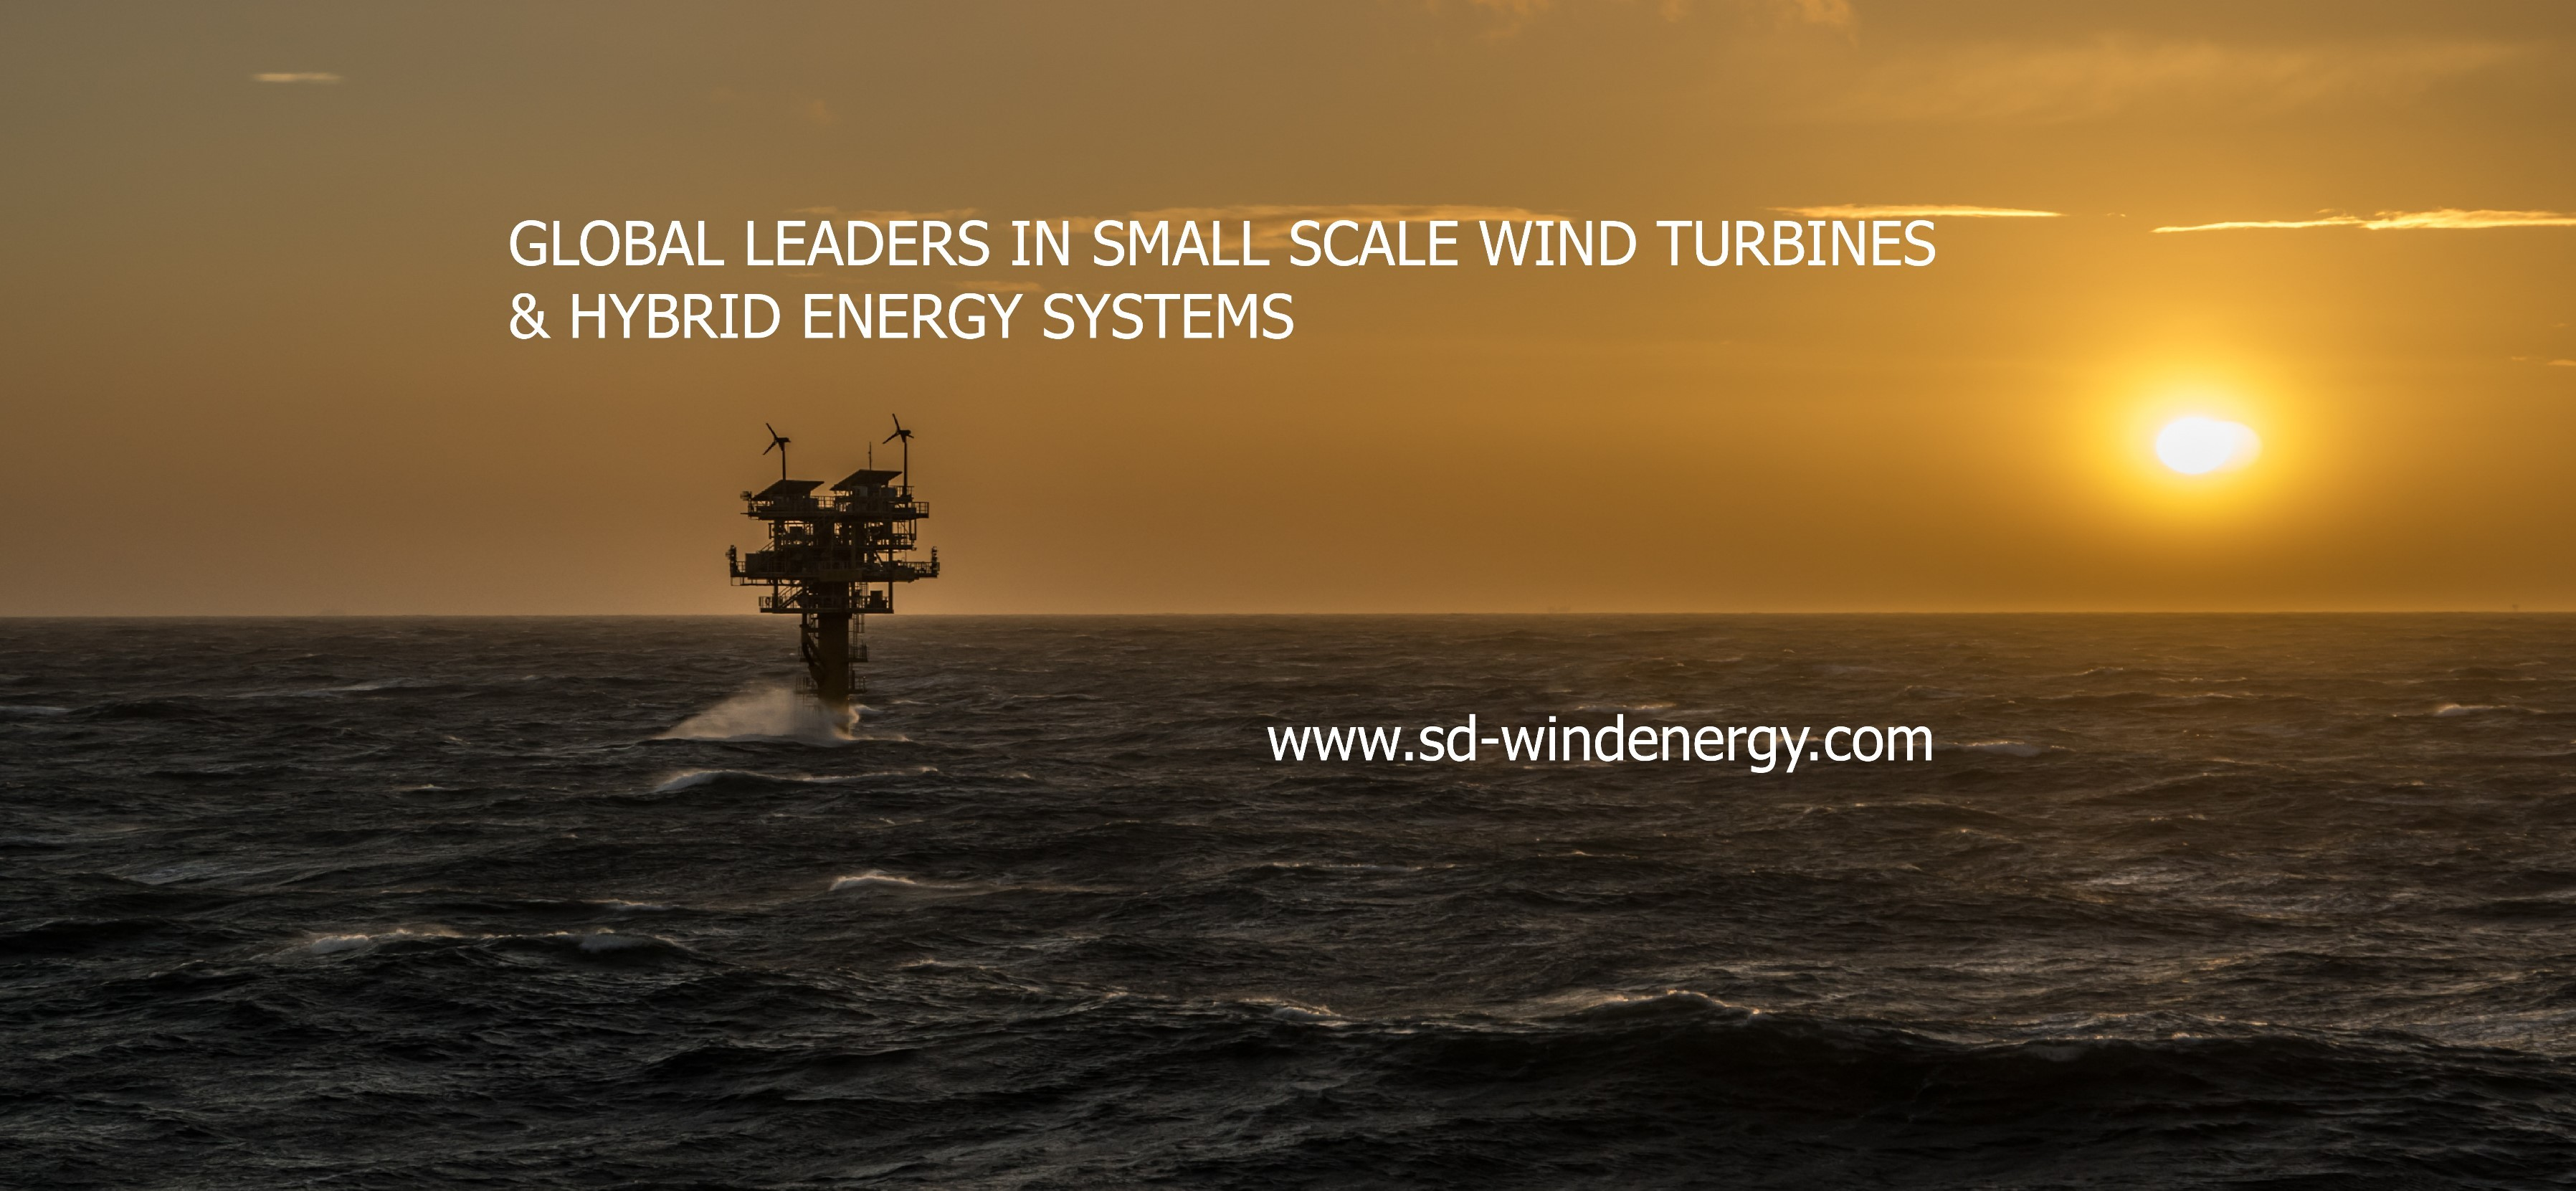 SD Wind Energy | LinkedIn